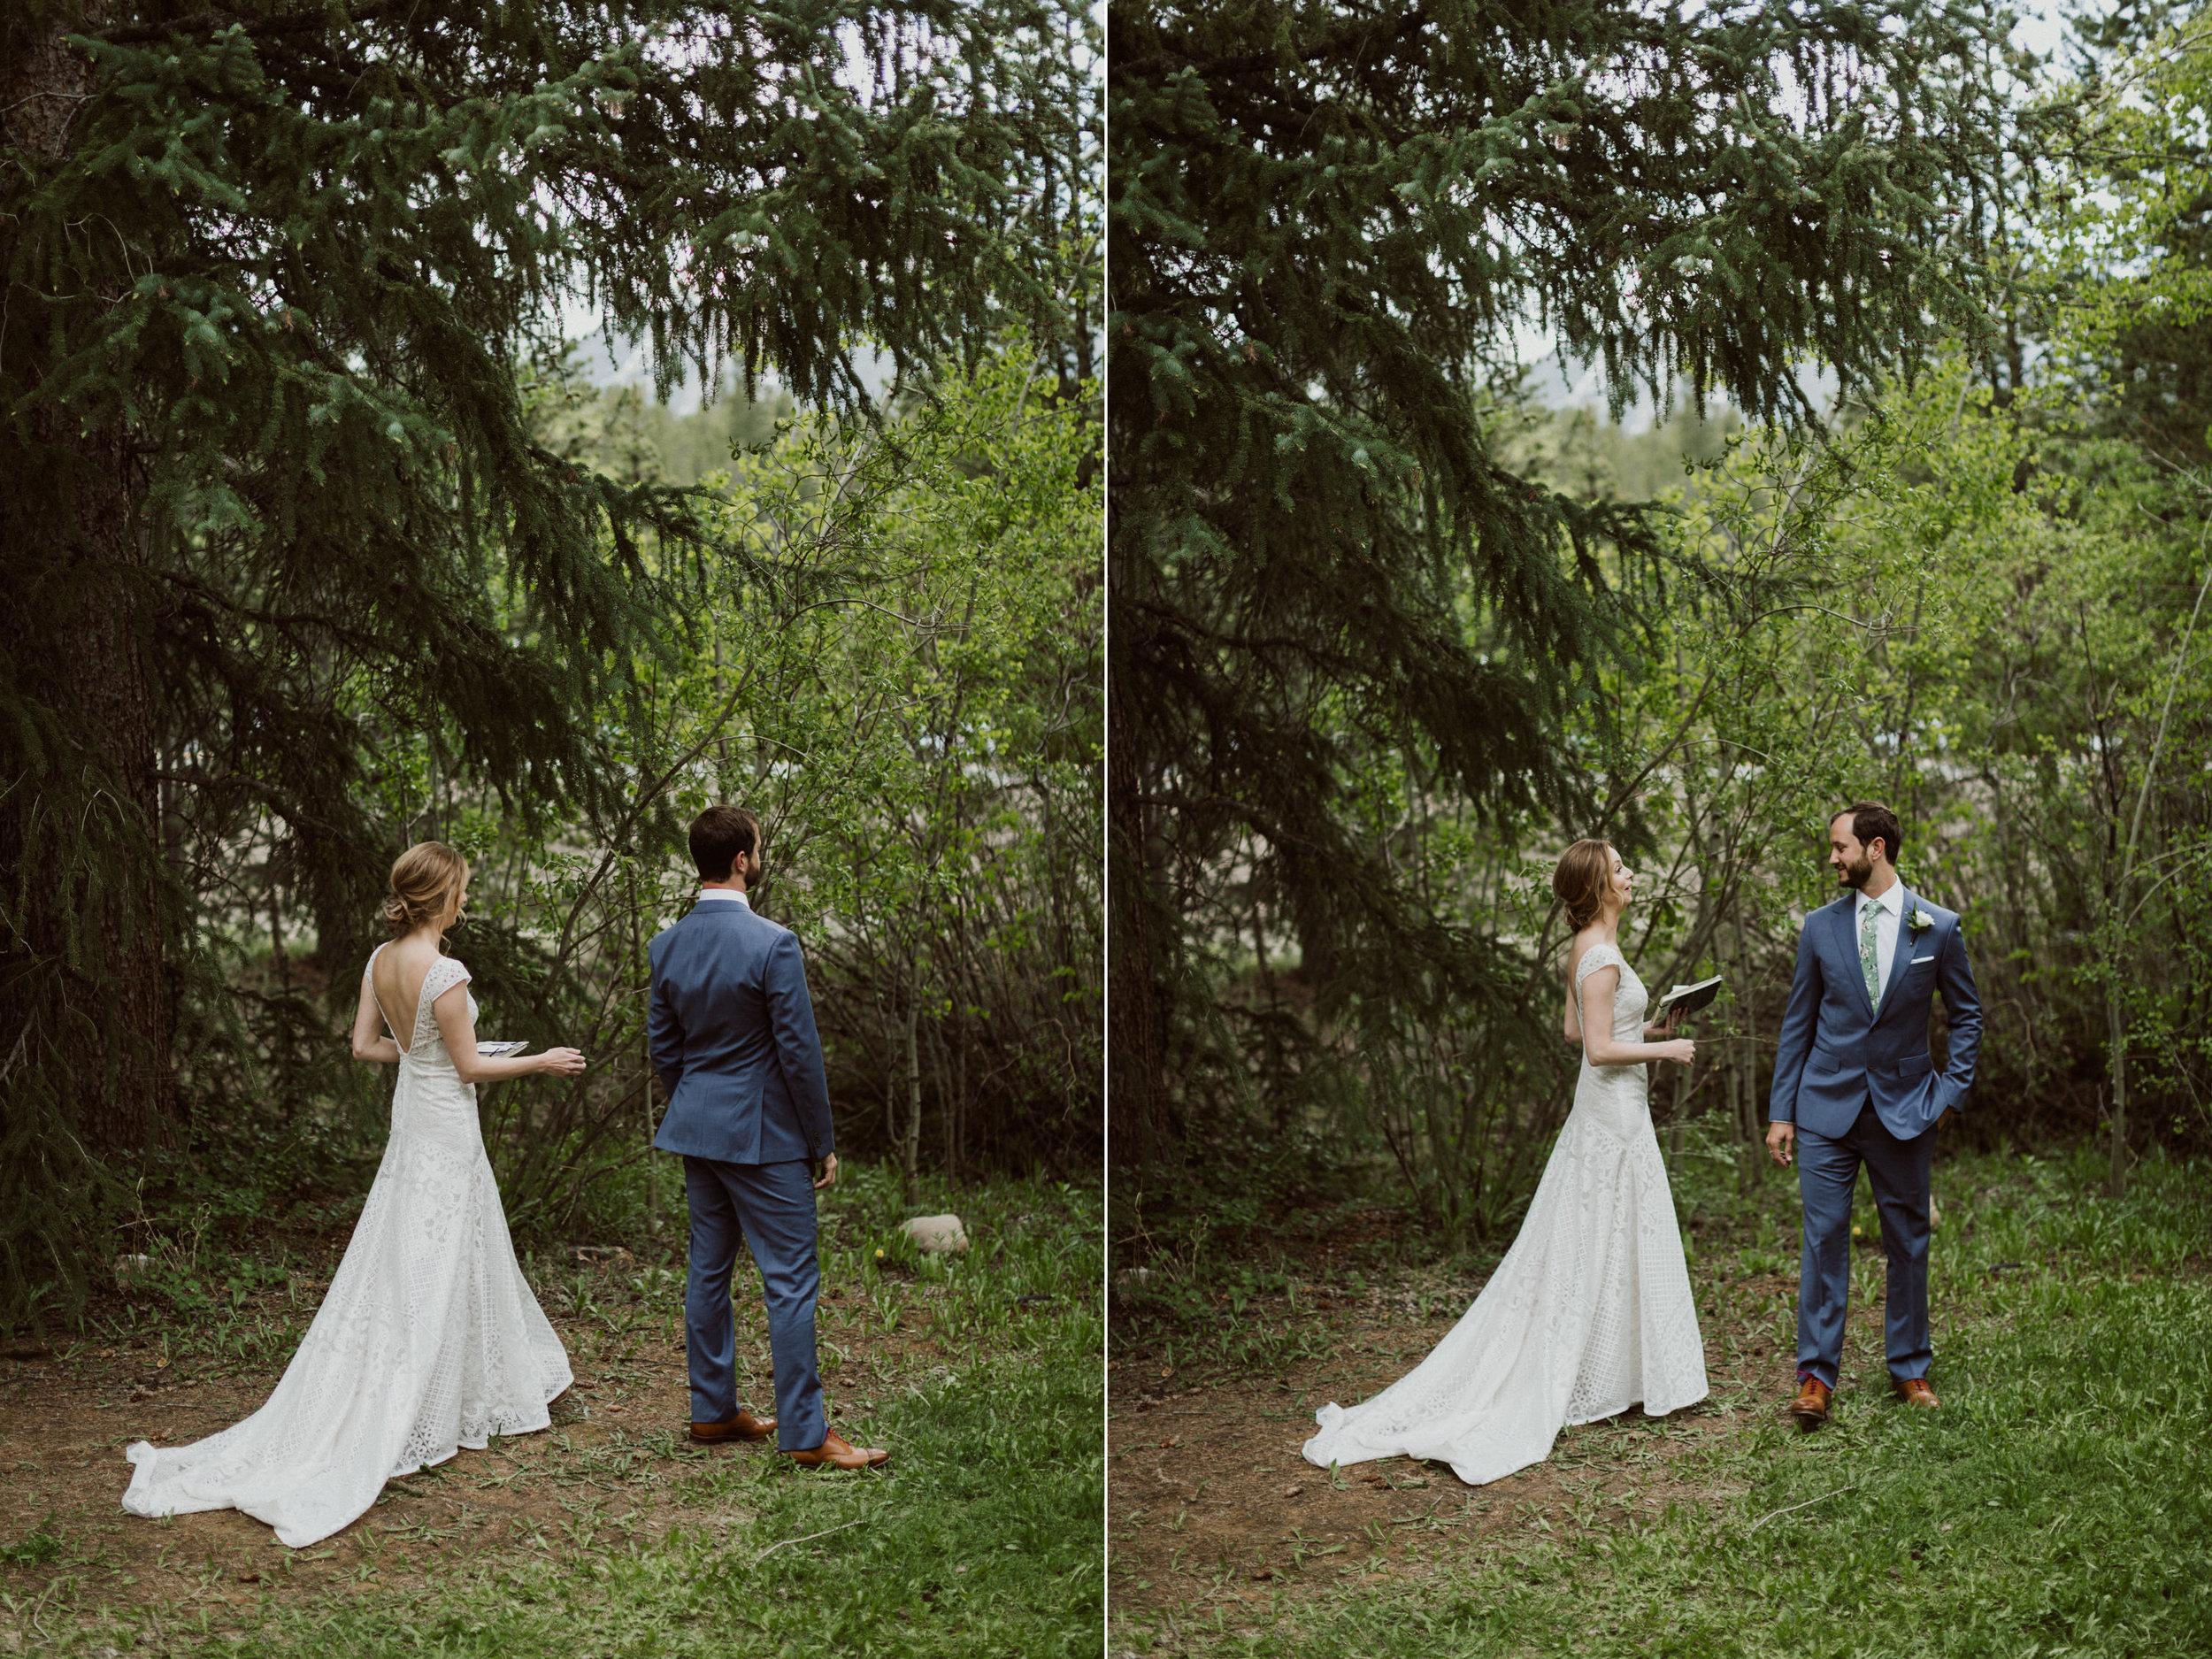 bohemian-backyard-wedding-breckenridge-colorado-162.jpg